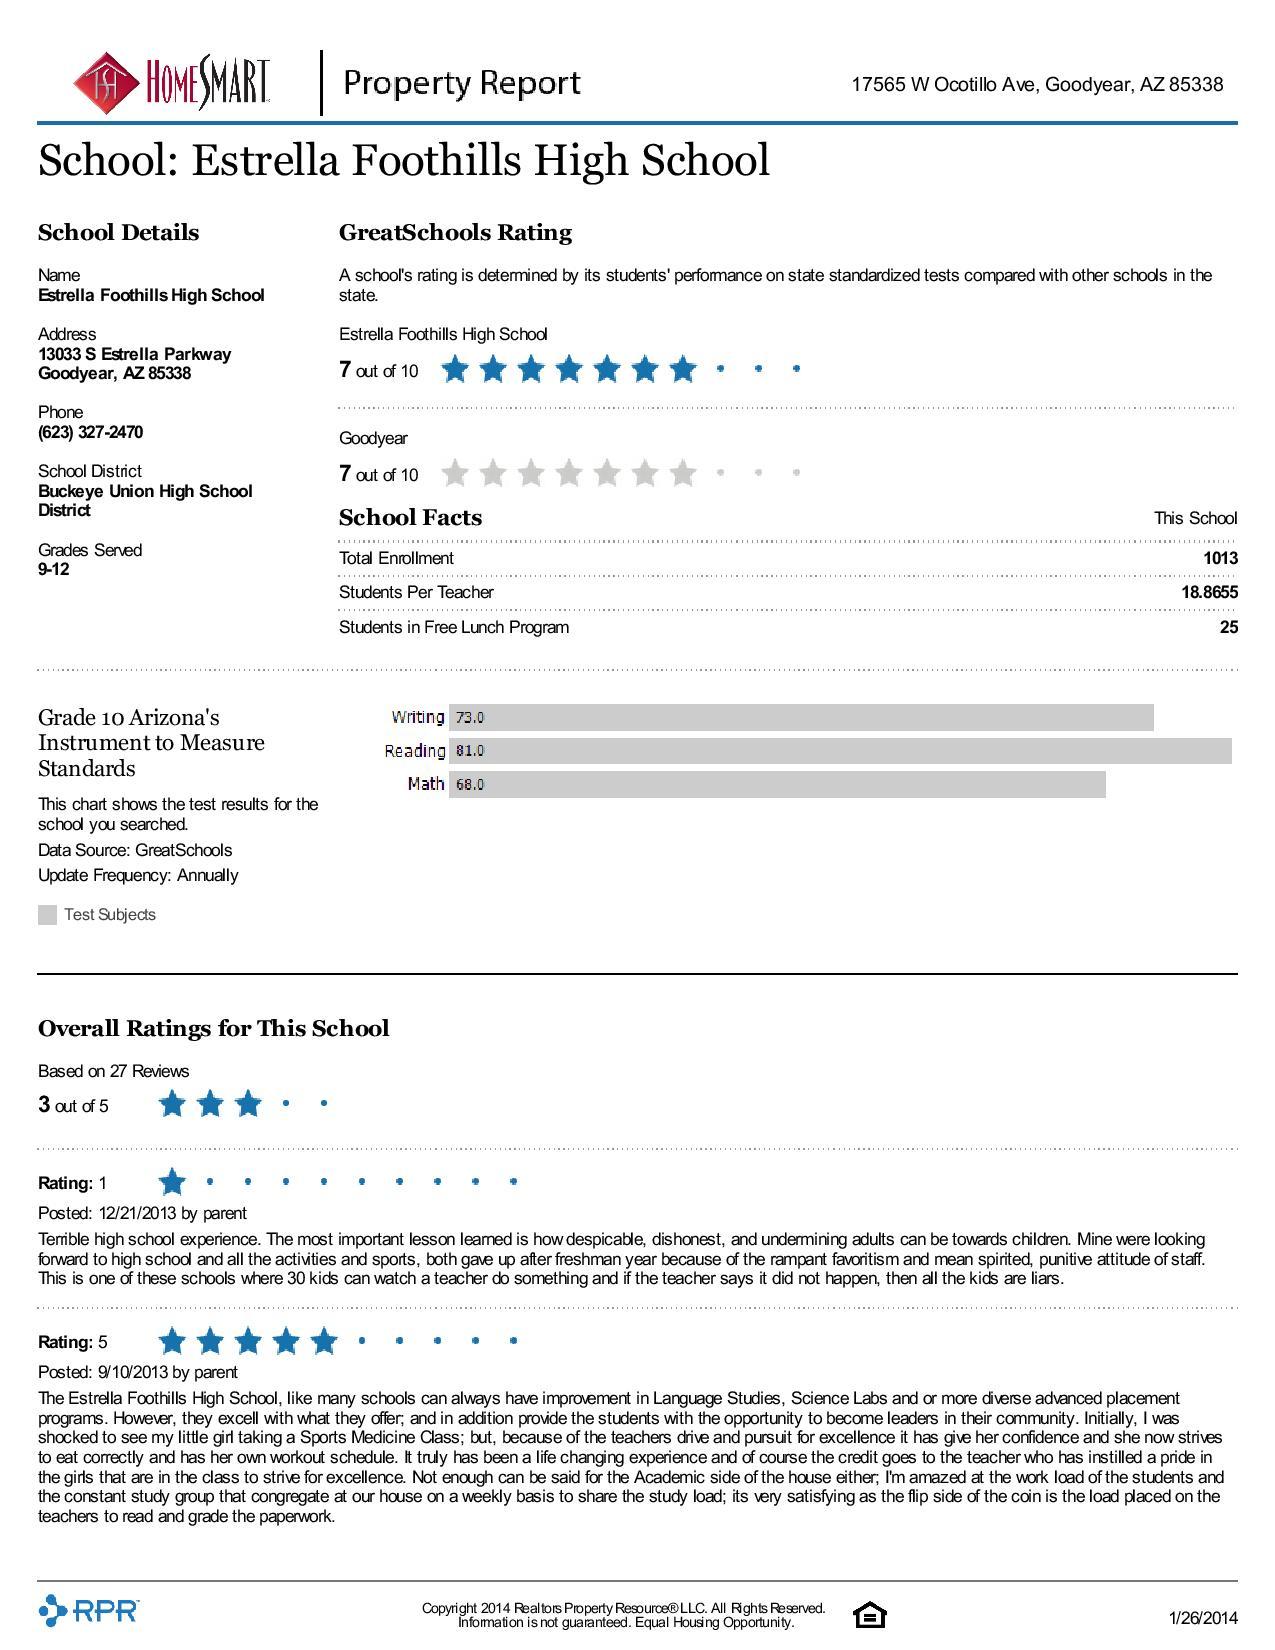 17565-W-Ocotillo-Ave-Goodyear-AZ-85338.pdf-page-009